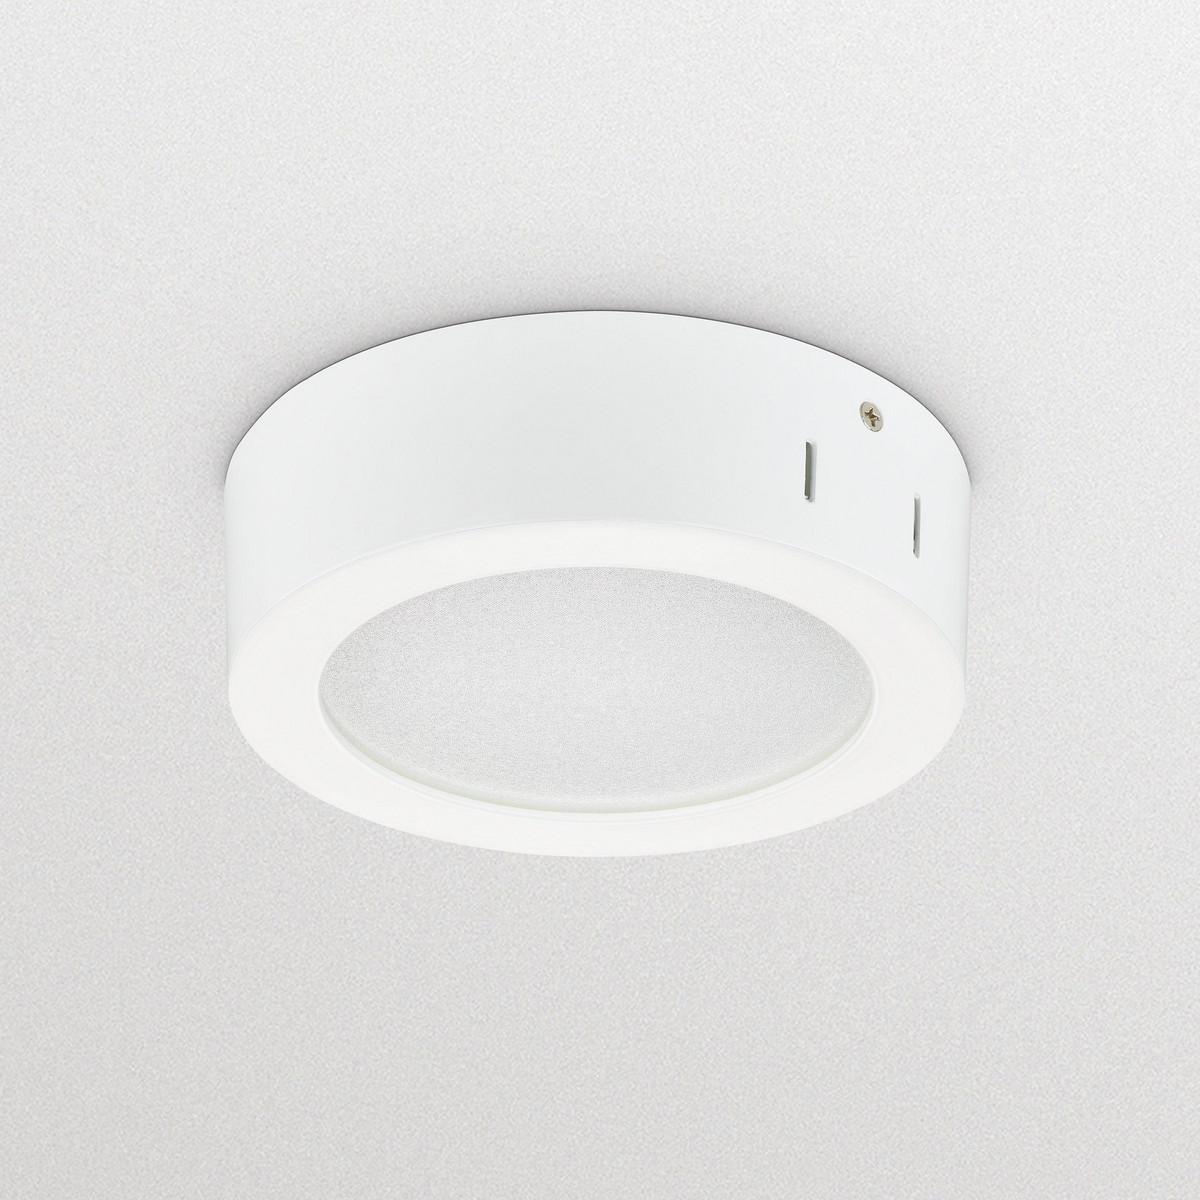 Philips CoreLine SlimDownlight Gen3 Påbyg DN145C 1100lm/840 11W Hvid